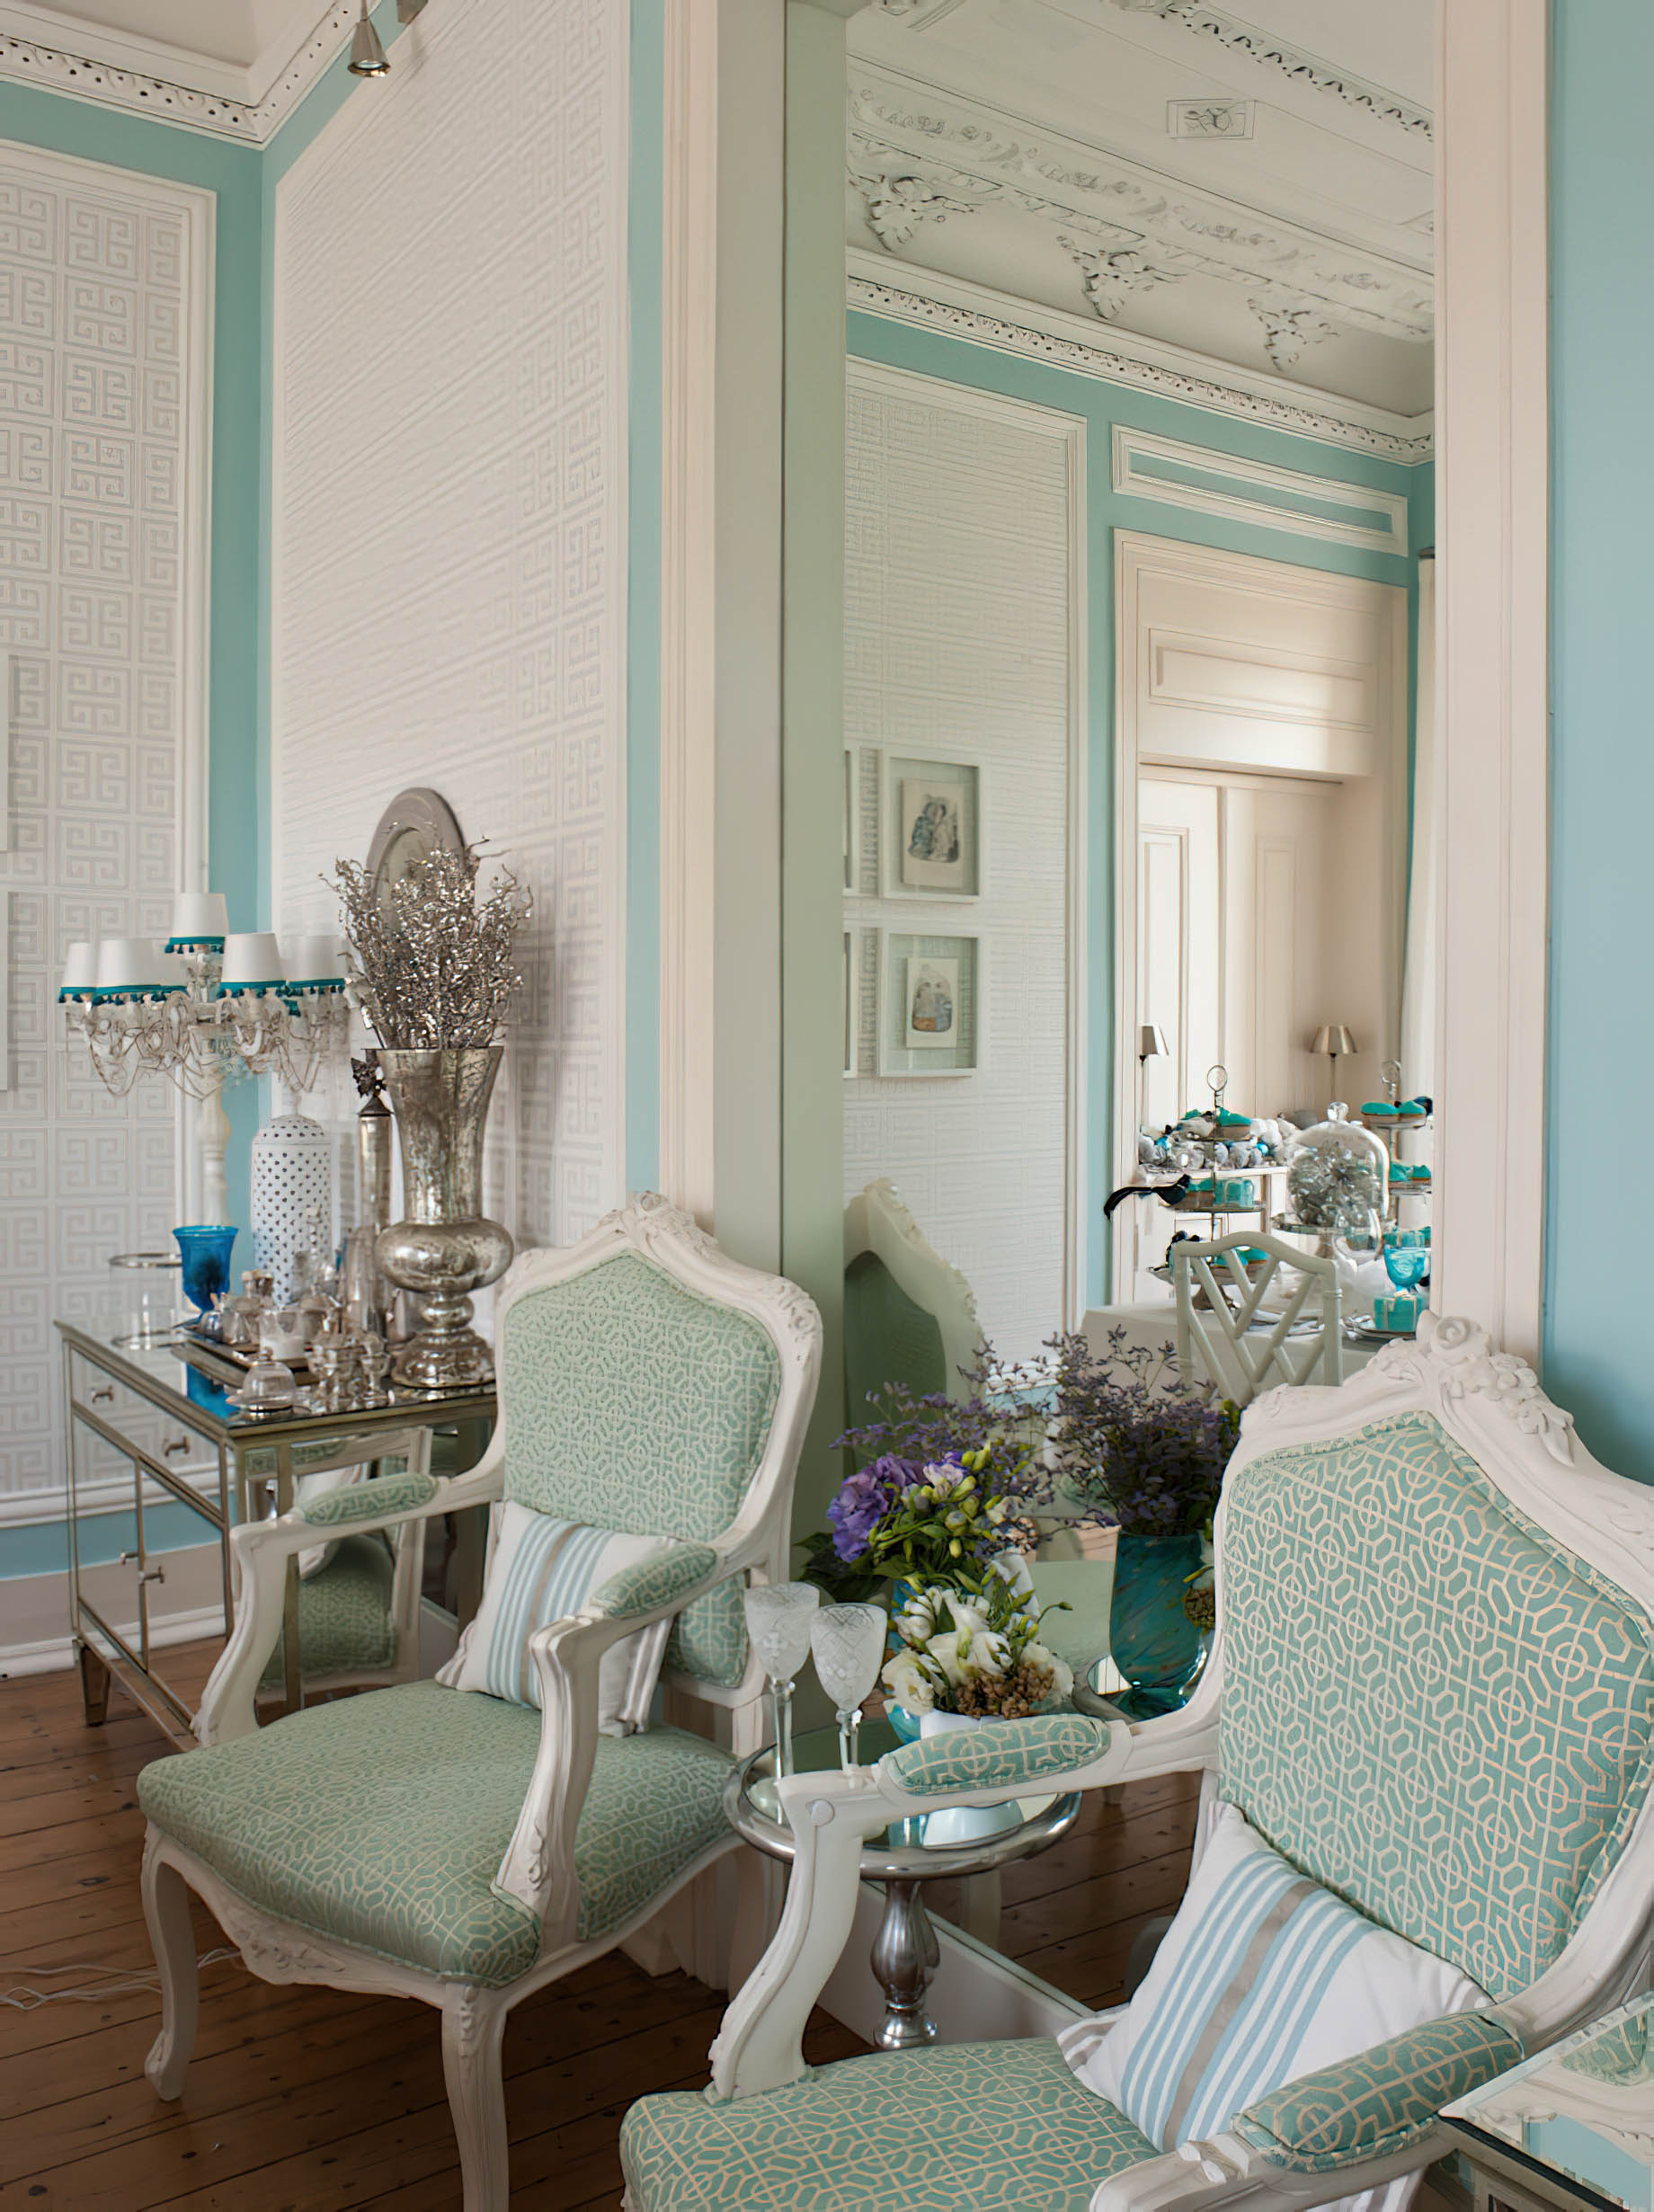 Chiado Charm Apartment Interior Design Lisbon, Portugal – Ana Antunes